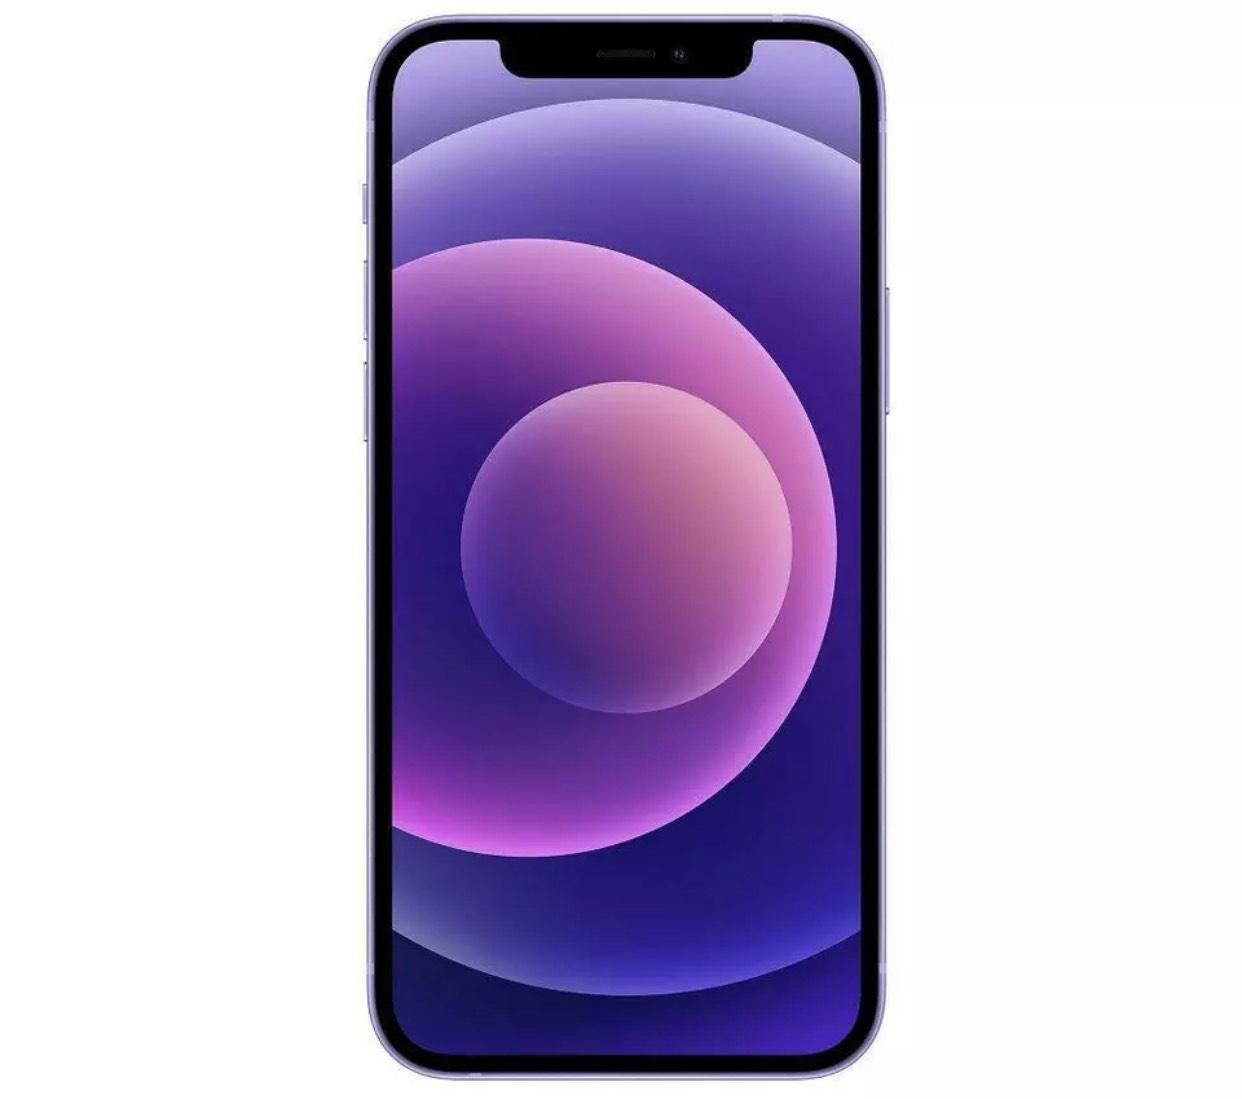 APPLE iPhone 12 Mini - 64 GB, Purple - £518.70 - @ Currys Clearance eBay